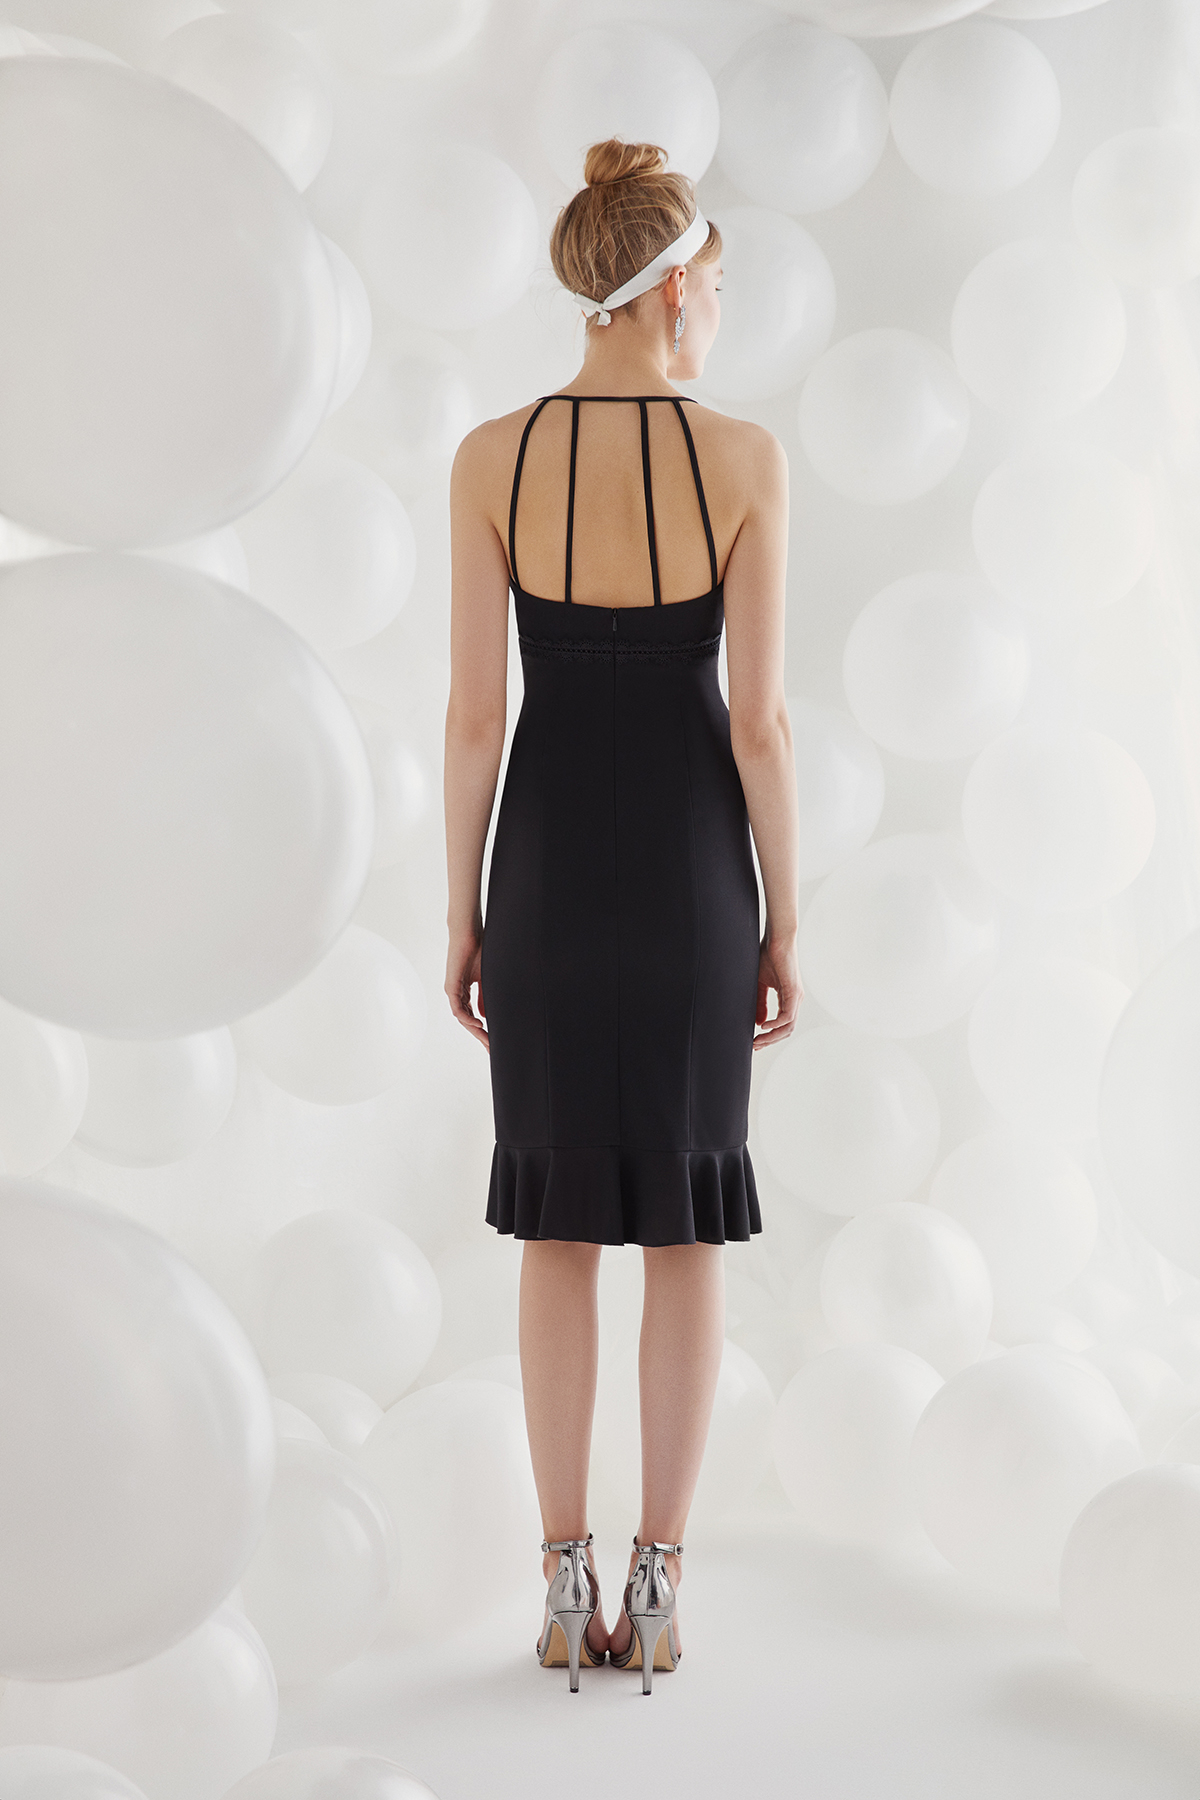 Siyah İnce Askılı Krep Kısa Elbise - Thumbnail